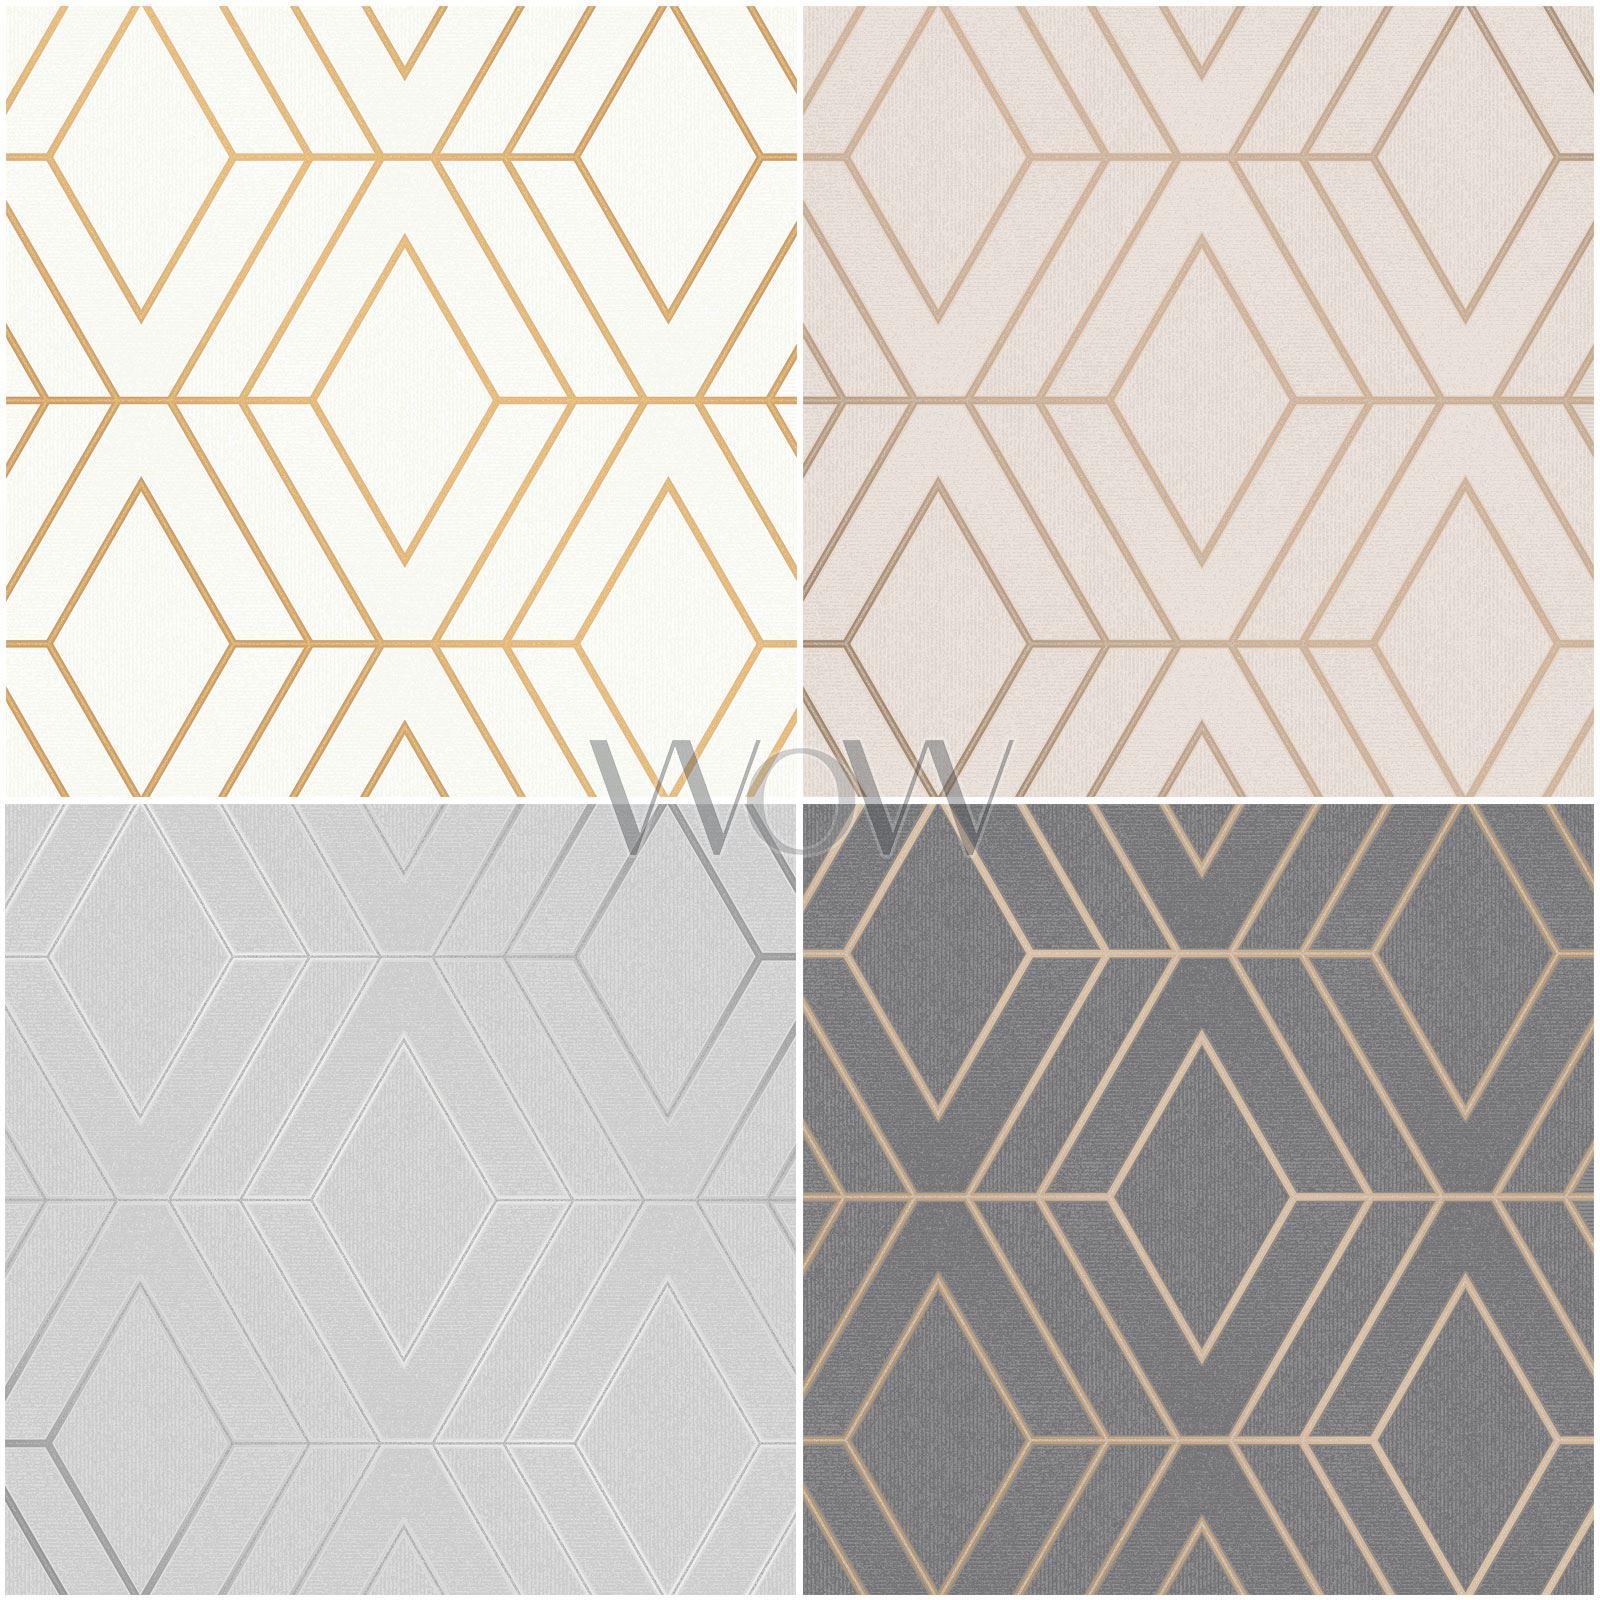 Charcoal Pulse Diamond Wallpaper Geometric Textured Glitter Metallic Fine Decor